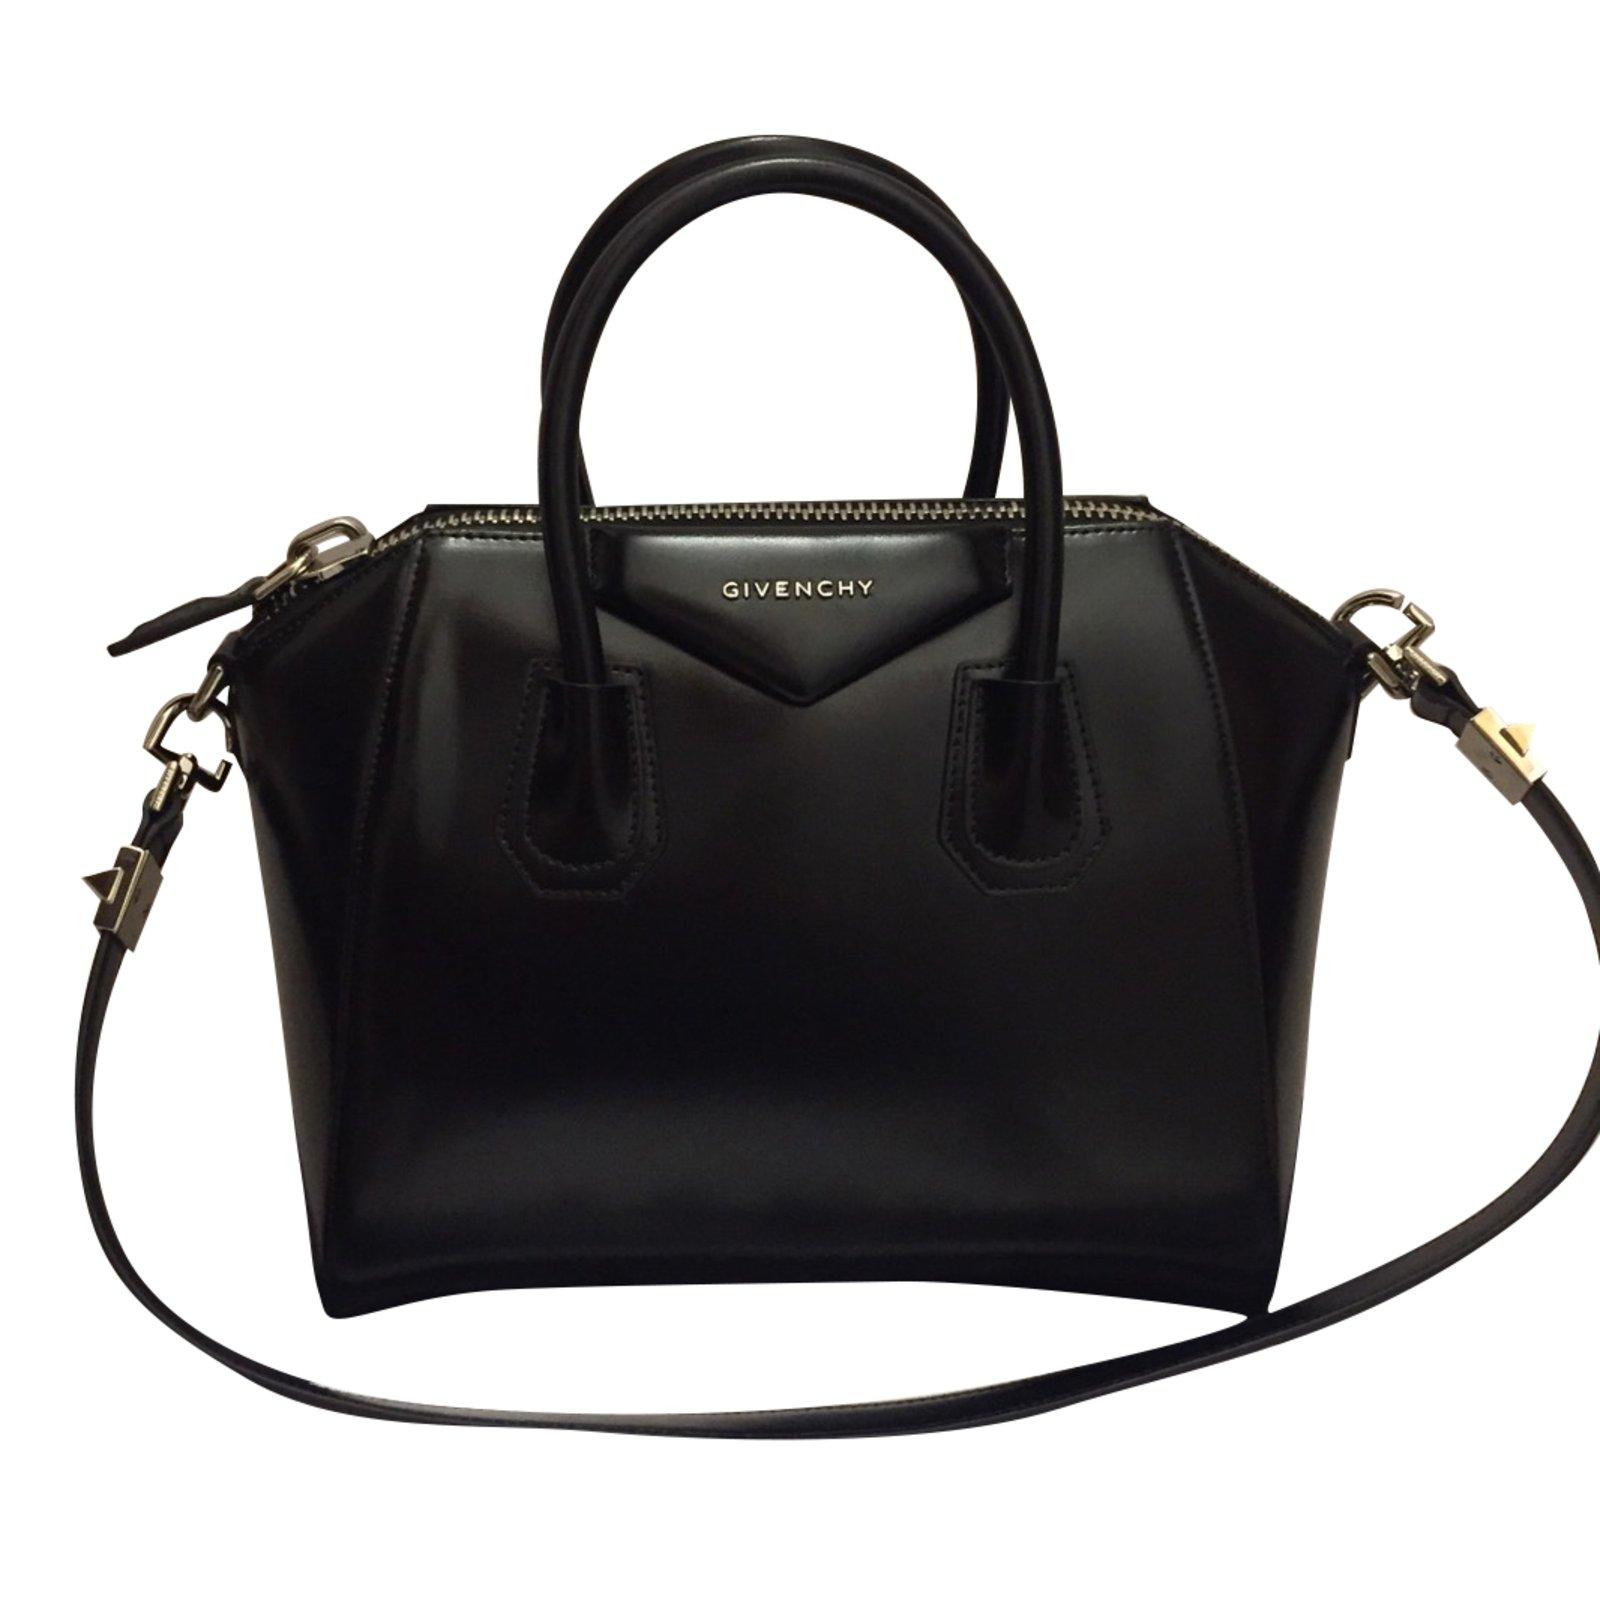 givenchy antigona small givenchy handbags leather black joli closet. Black Bedroom Furniture Sets. Home Design Ideas